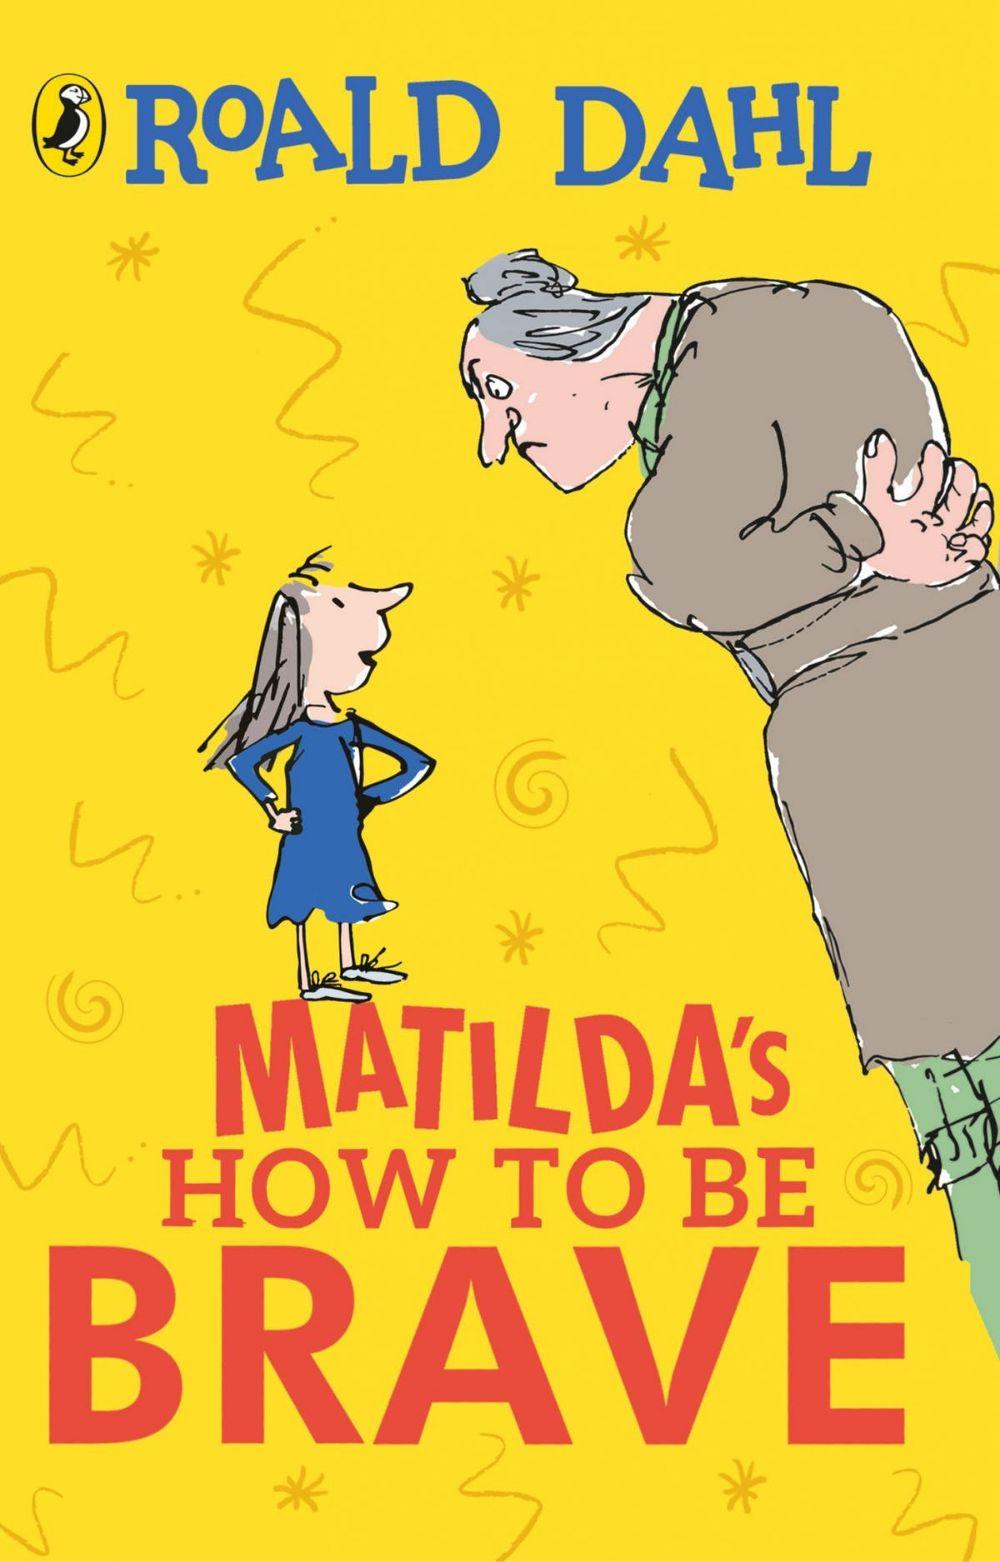 Baking: Easy chocolate cake recipe from Matilda